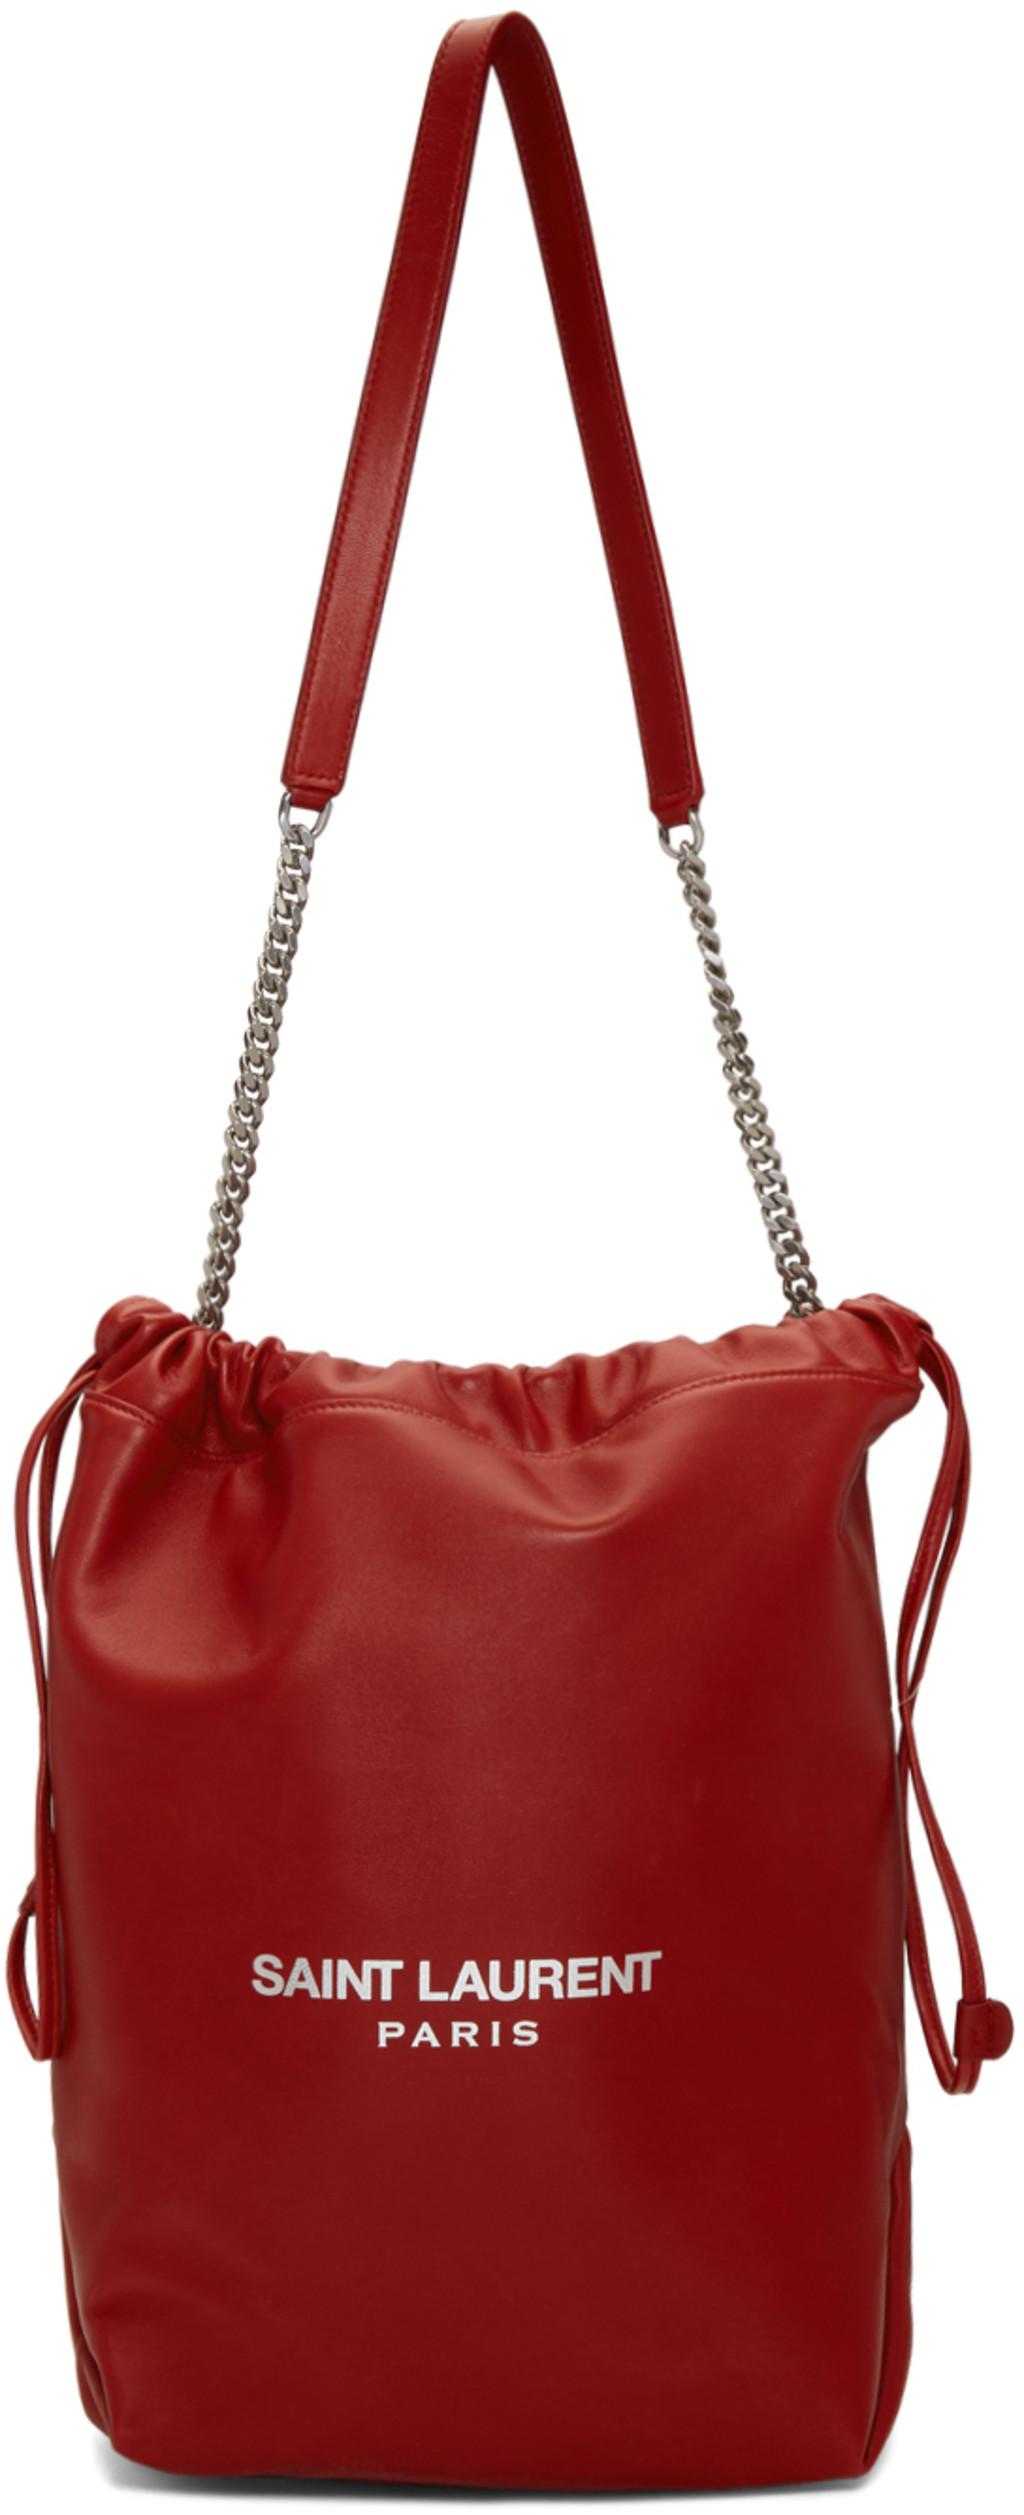 32ab8ecc3cf4 Saint Laurent bags for Women